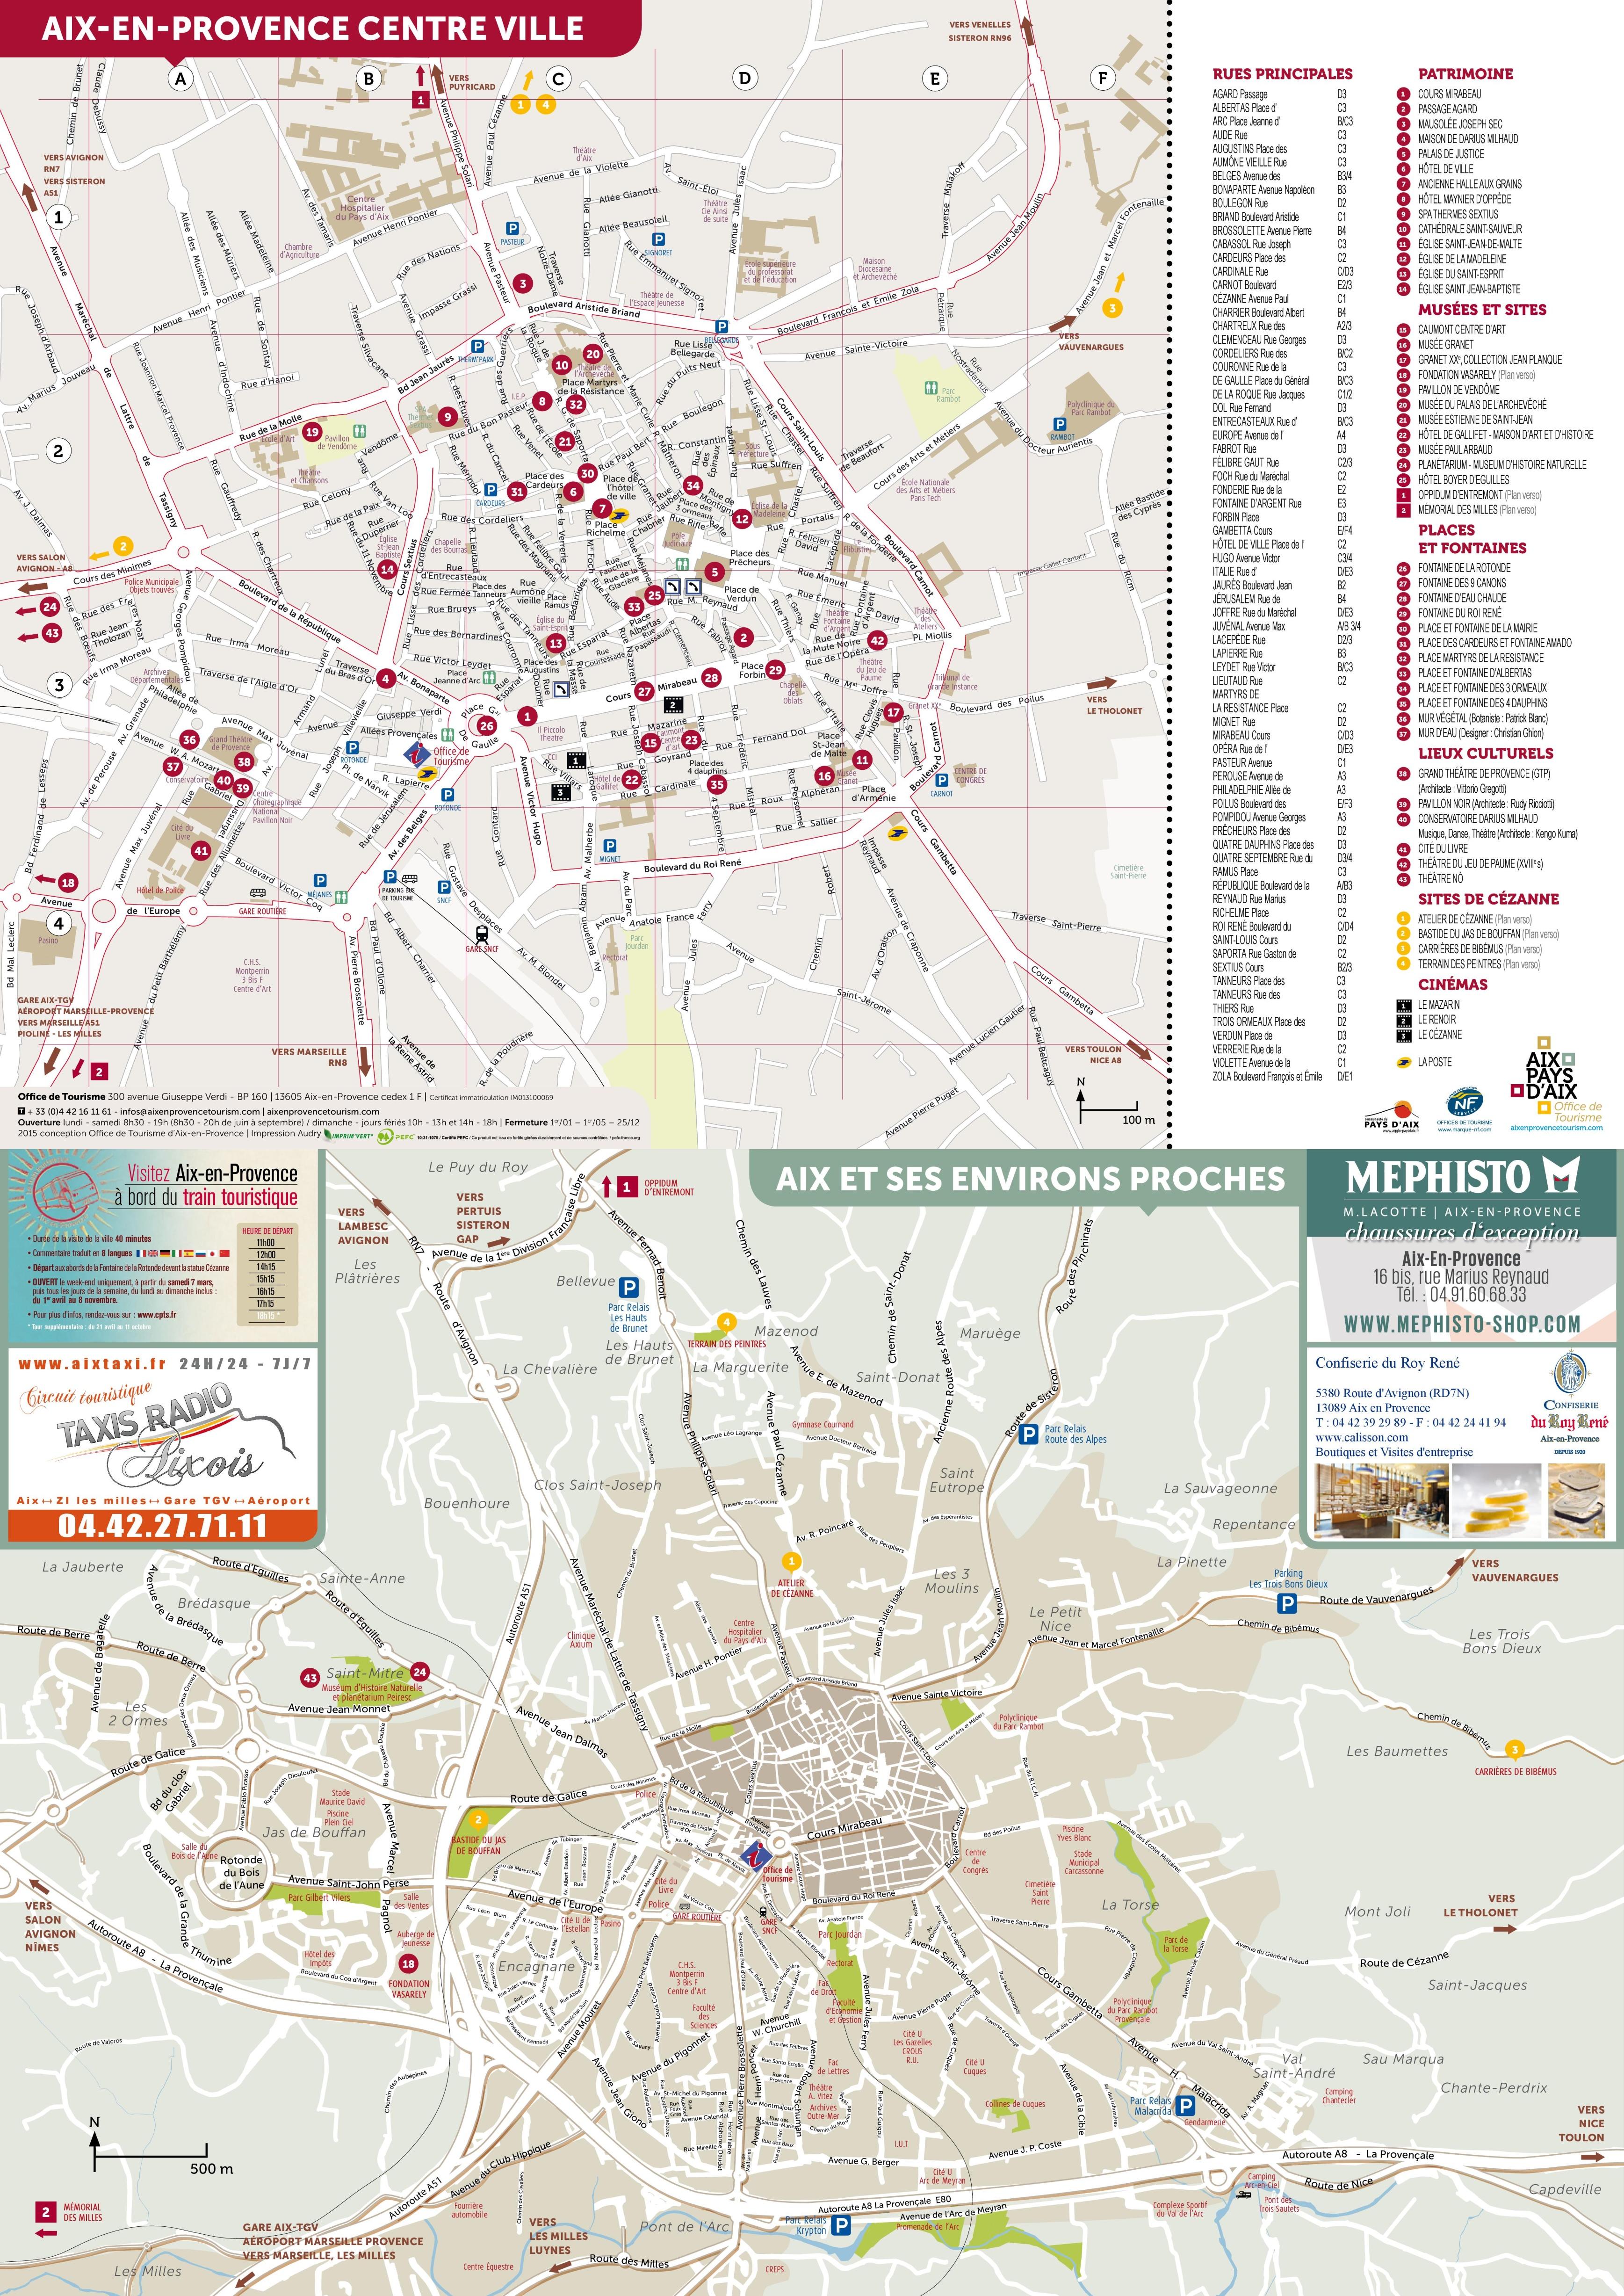 AixenProvence tourist map